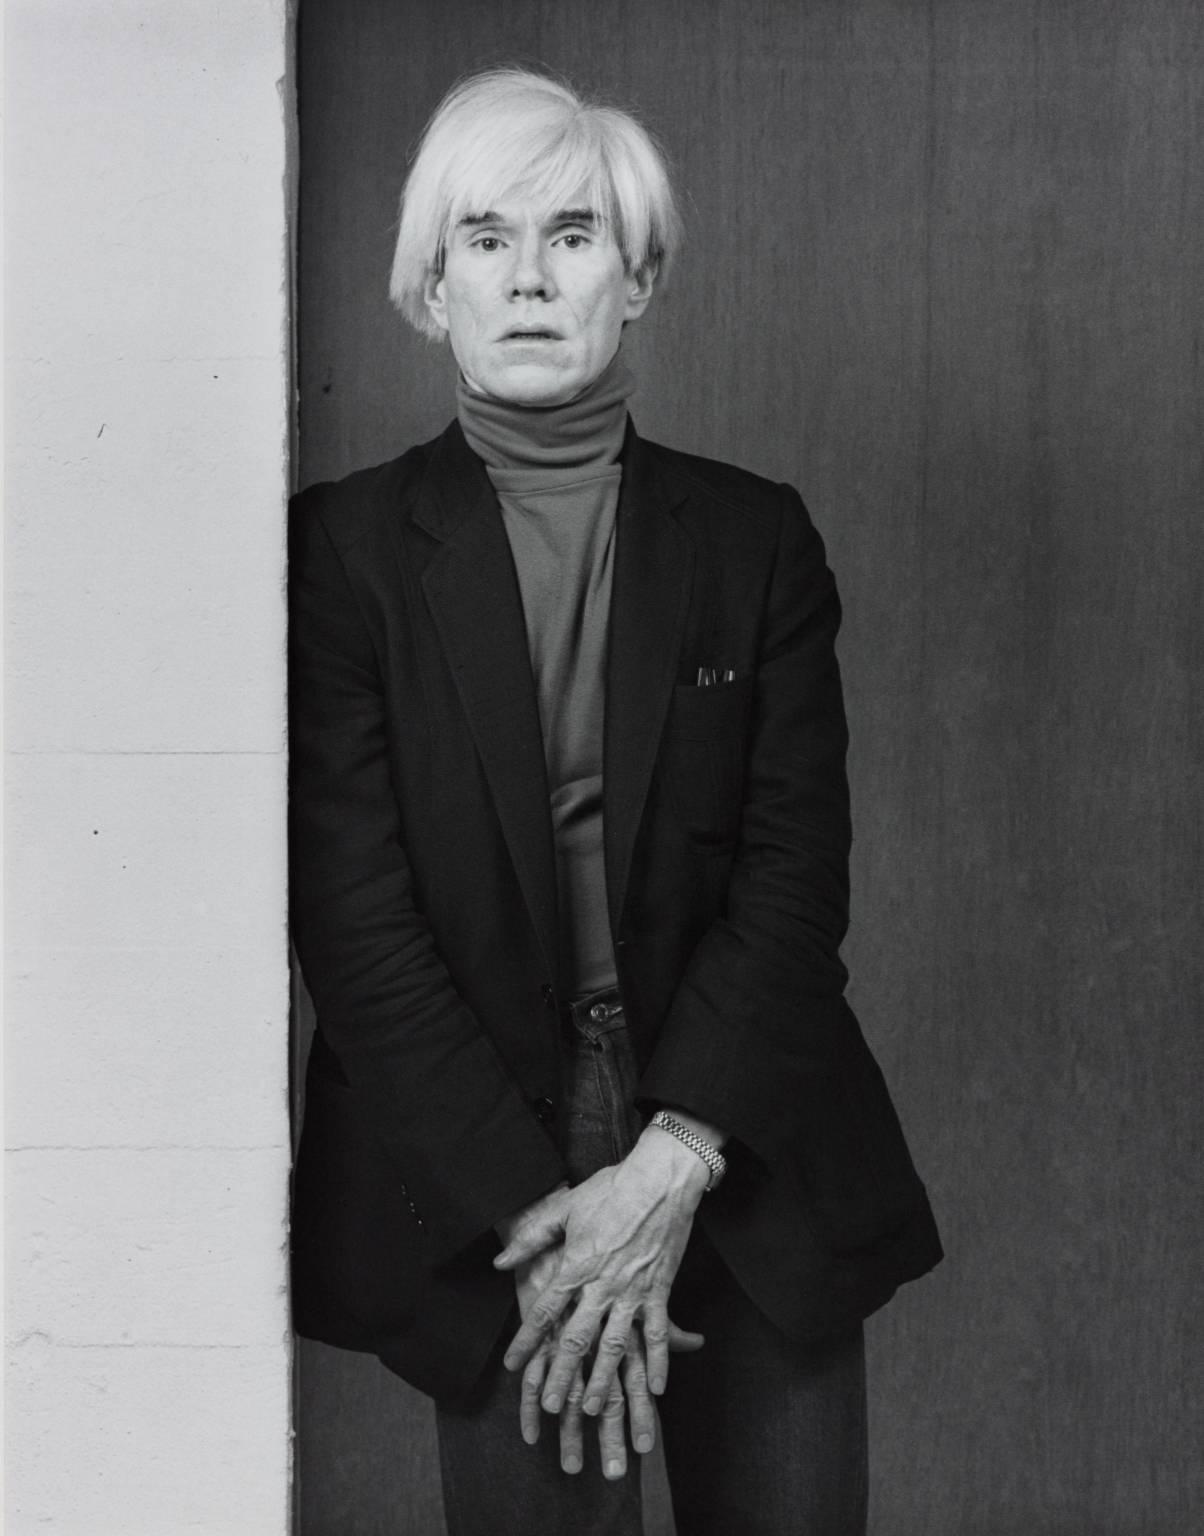 Robert Mapplethorpe, 'Andy Warhol' 1983